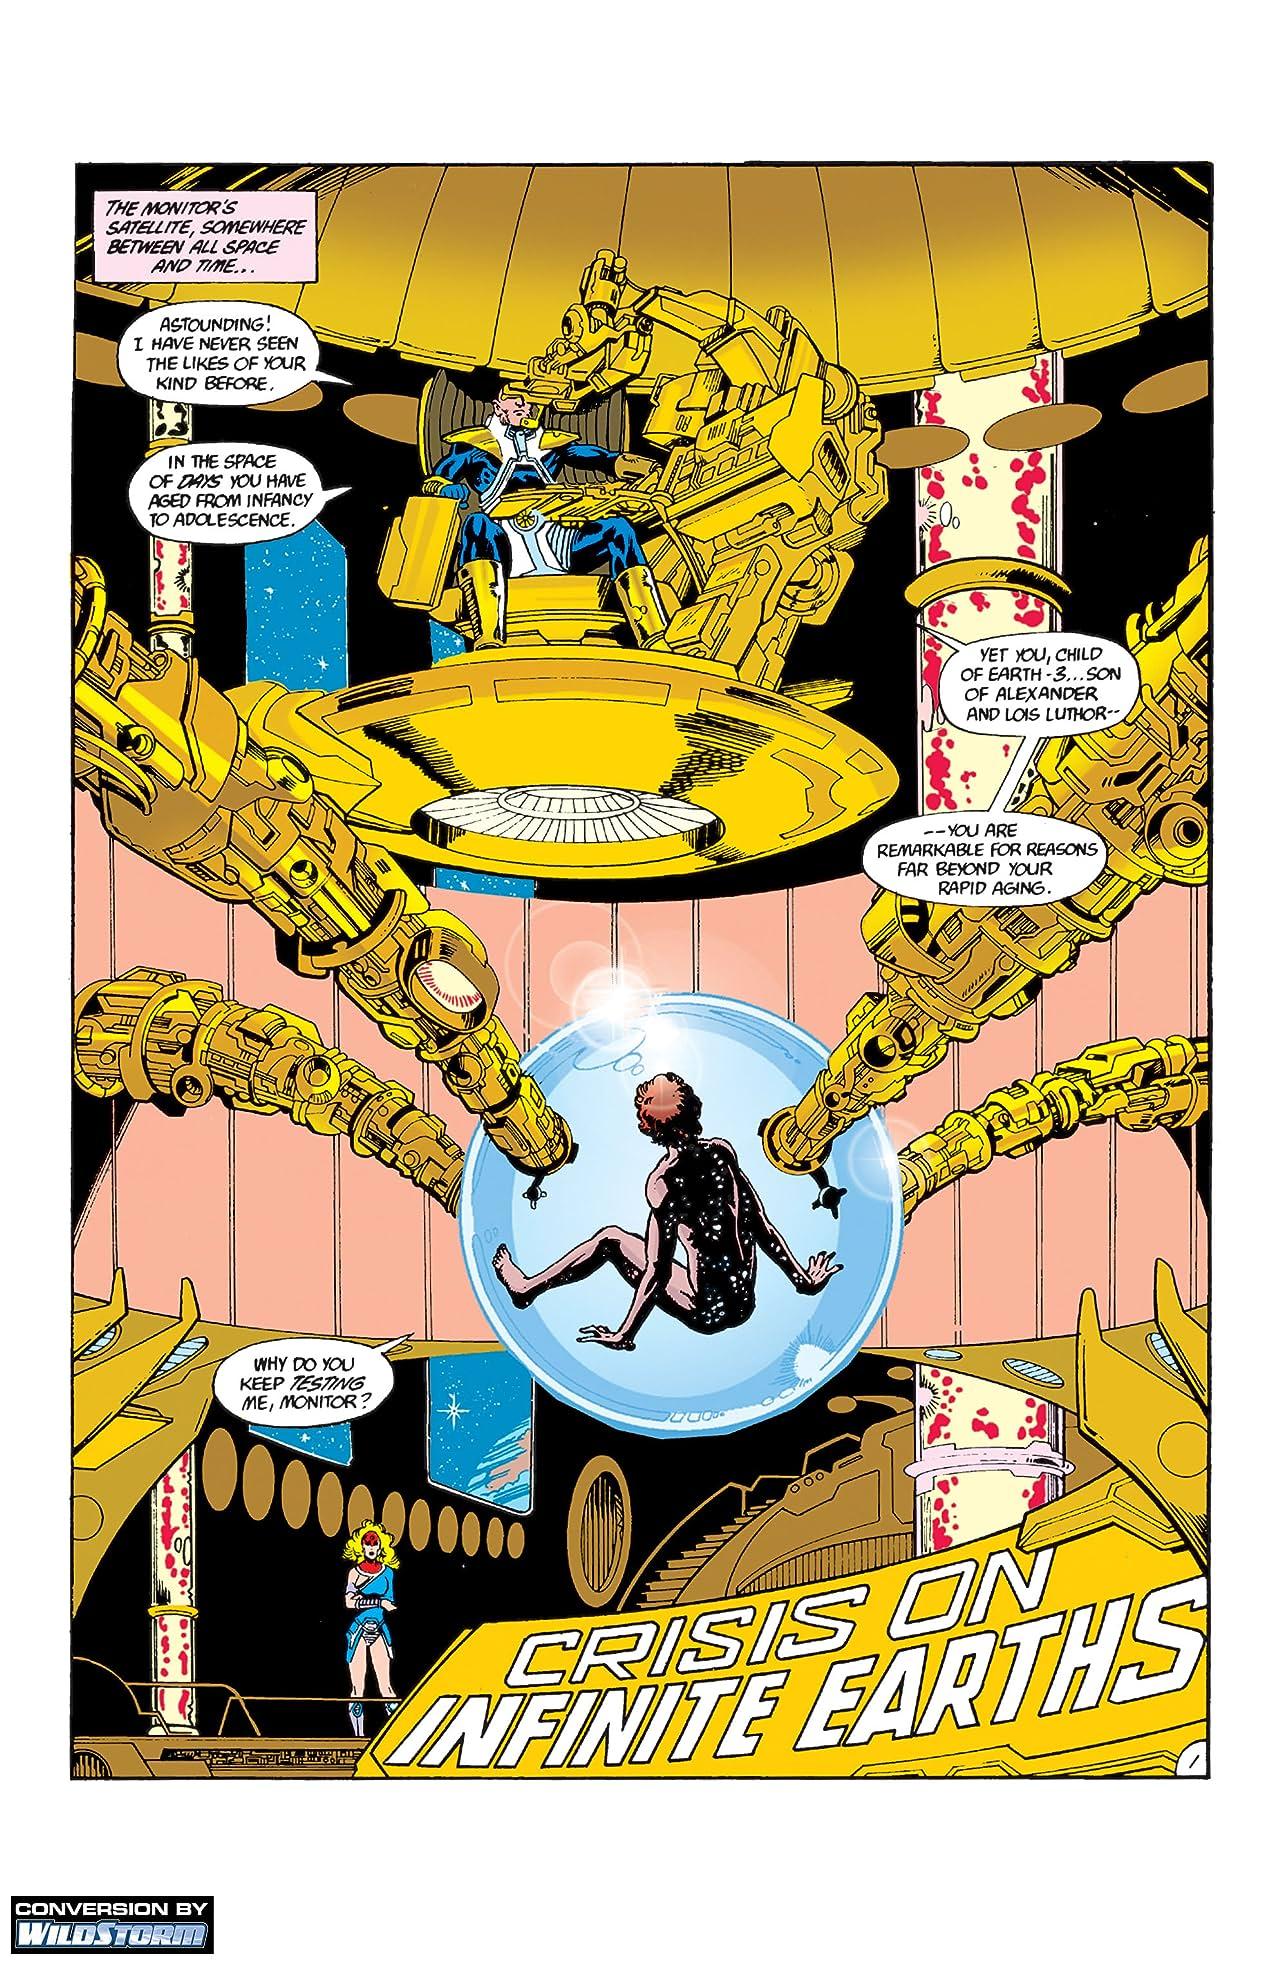 Crisis on Infinite Earths #3